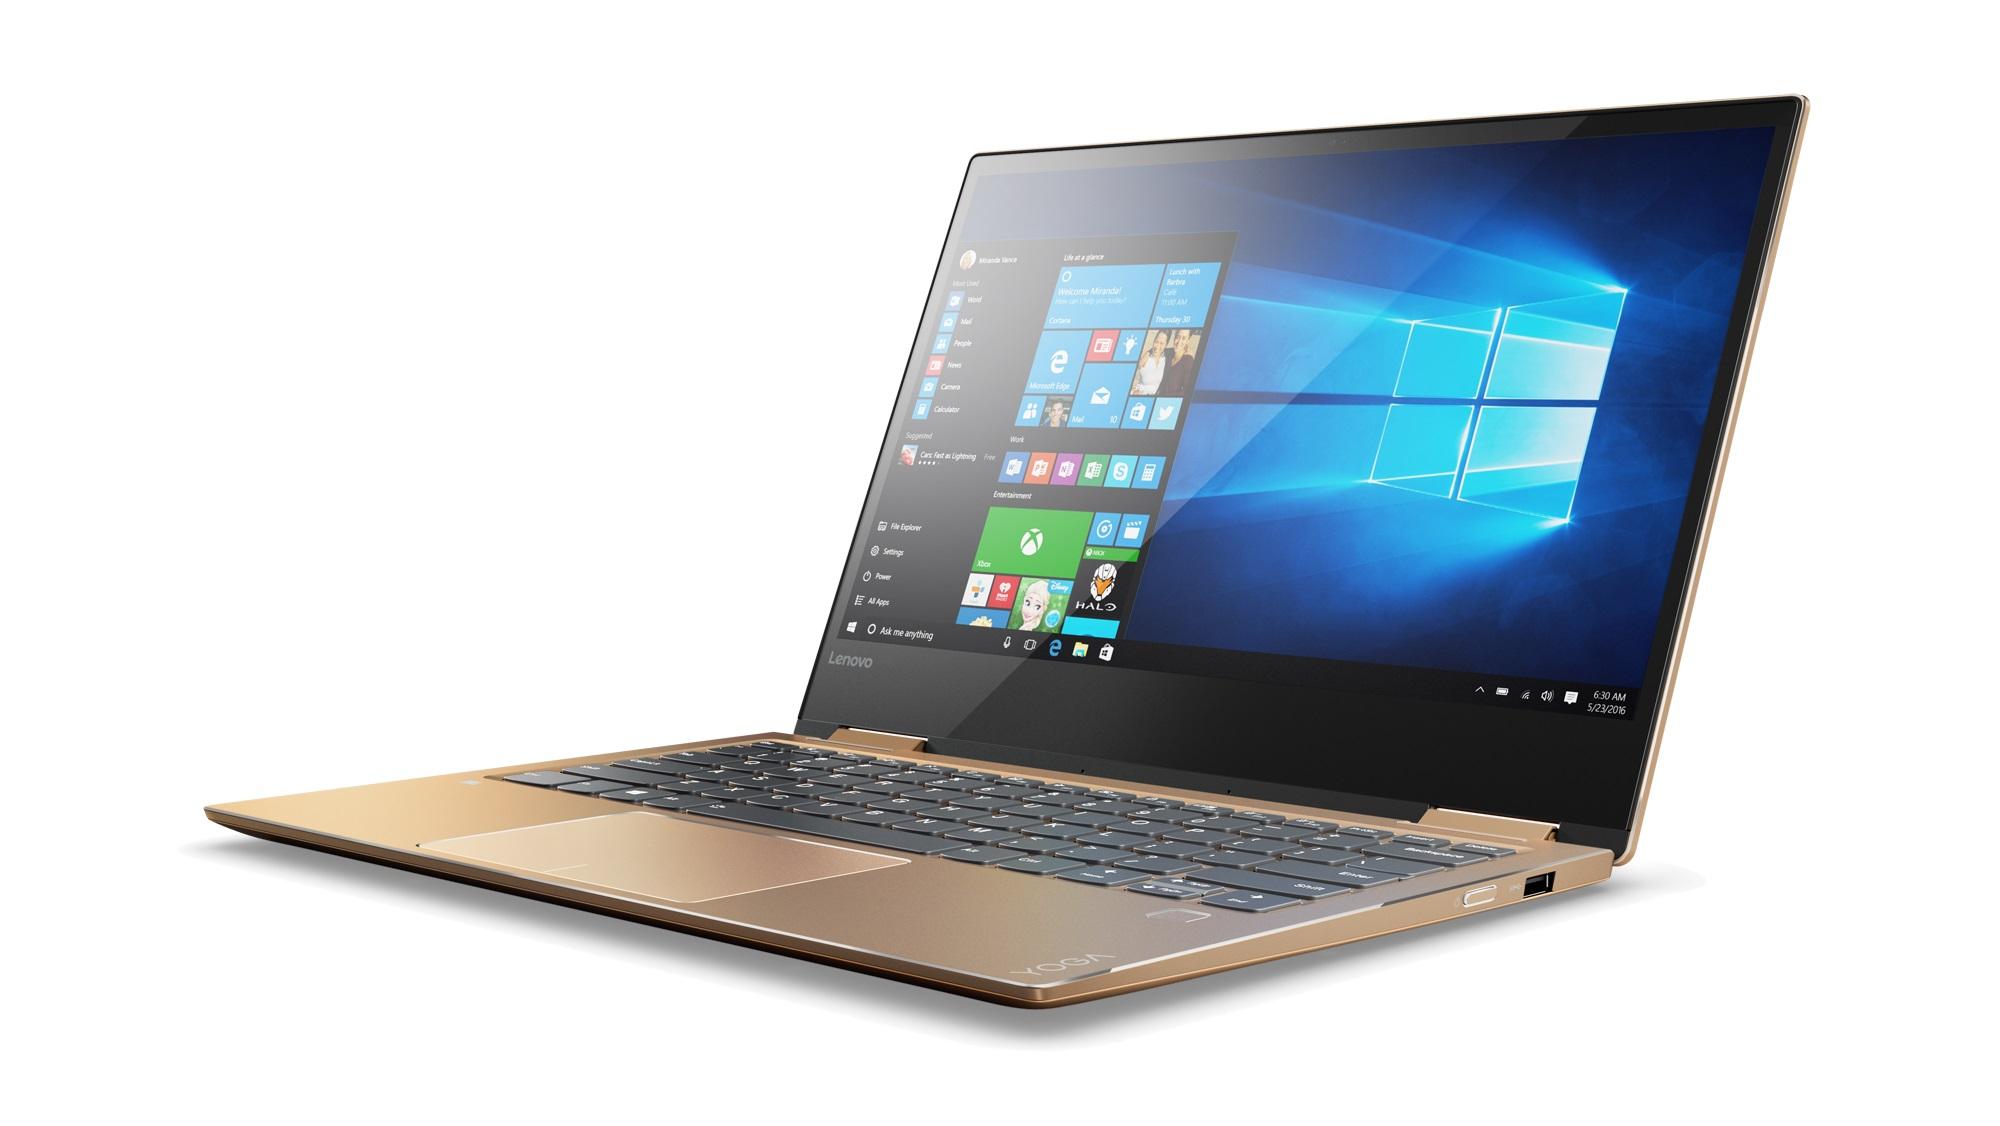 "Lenovo YOGA 720-13IKB i5-7200U 3,10GHz/8GB/SSD 256GB/13,3"" FHD/IPS/AG/multitouch/WIN10 měděná 80X60017CK"